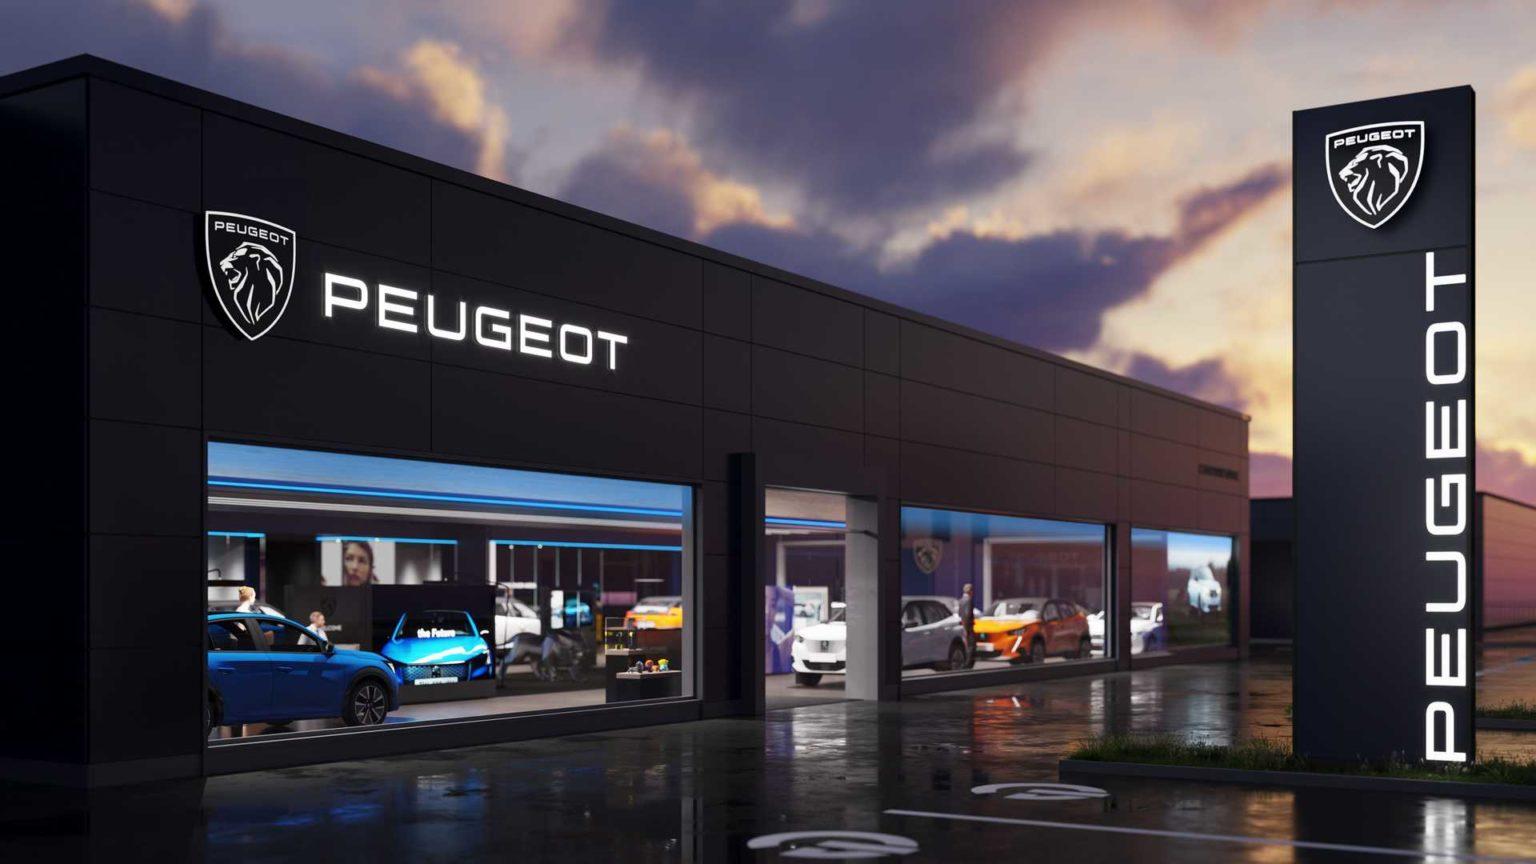 Peugeot estreia novo logotipo e muda identidade para perfil de luxo